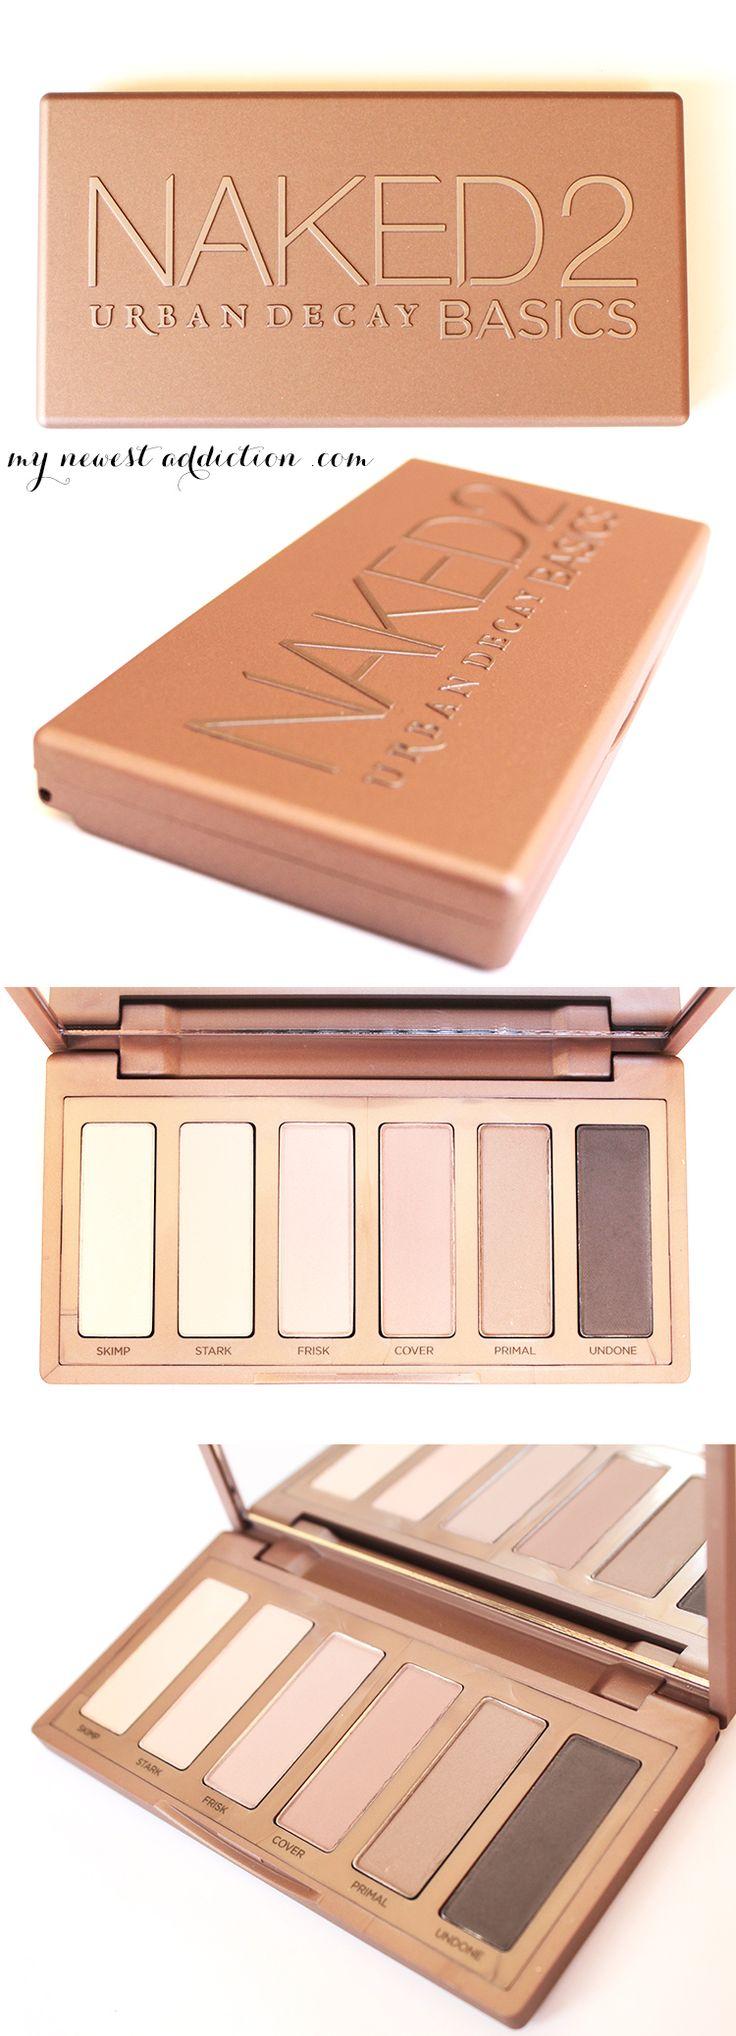 Urban Decay Naked Basics 2 - My Newest Addiction Beauty Blog